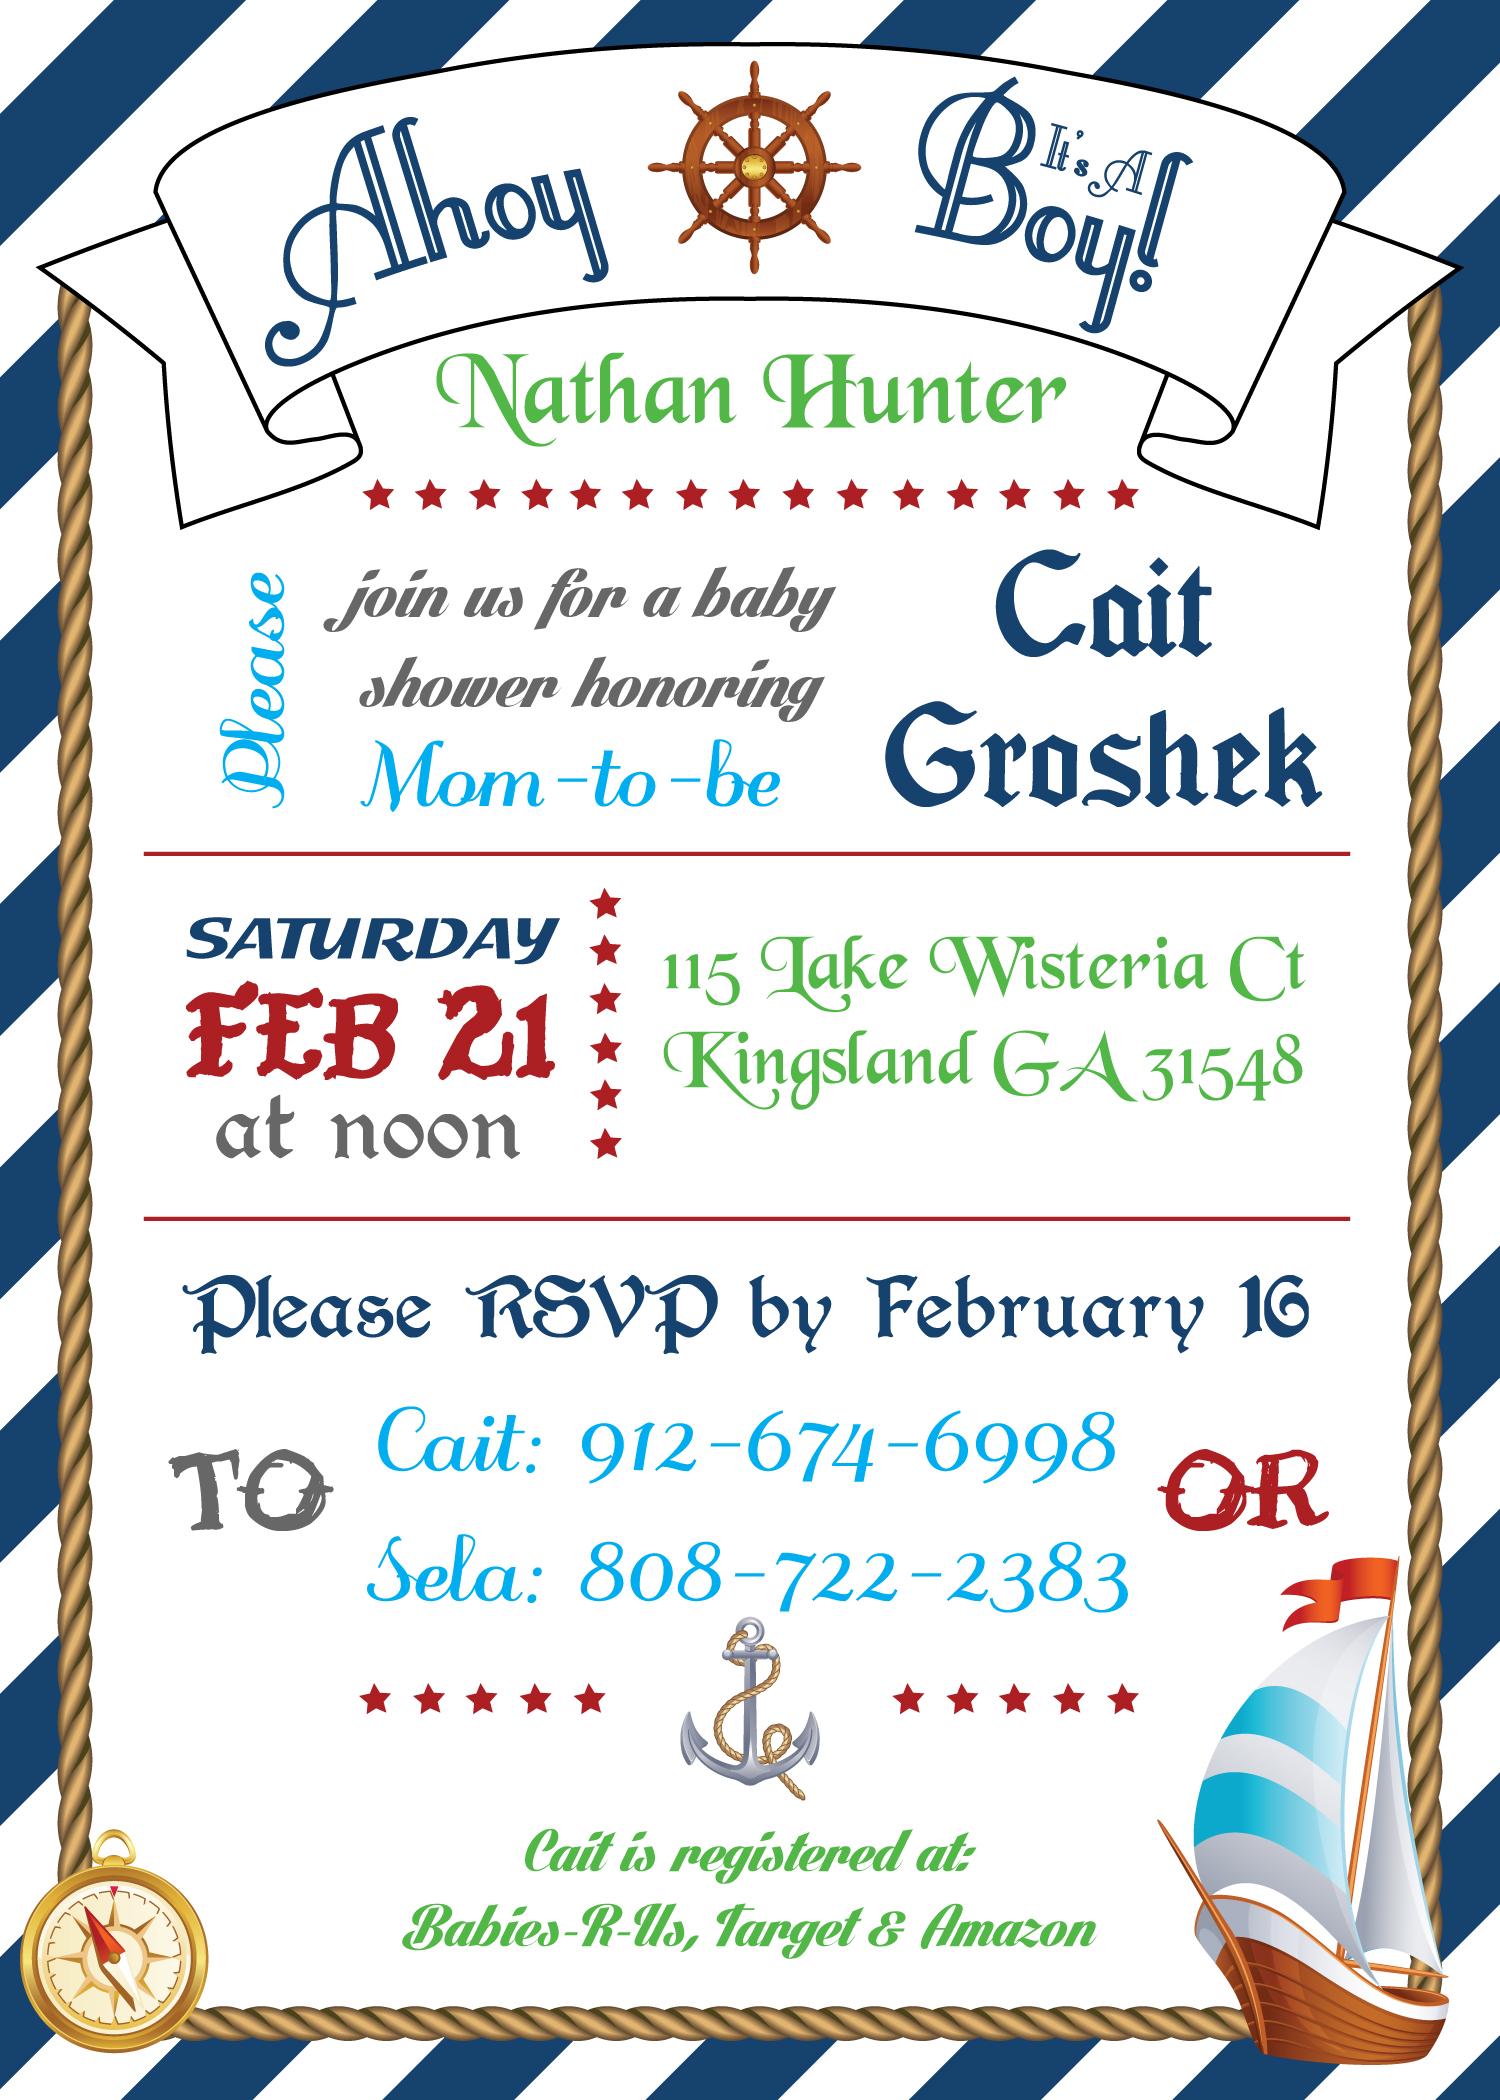 Babyshower invite design